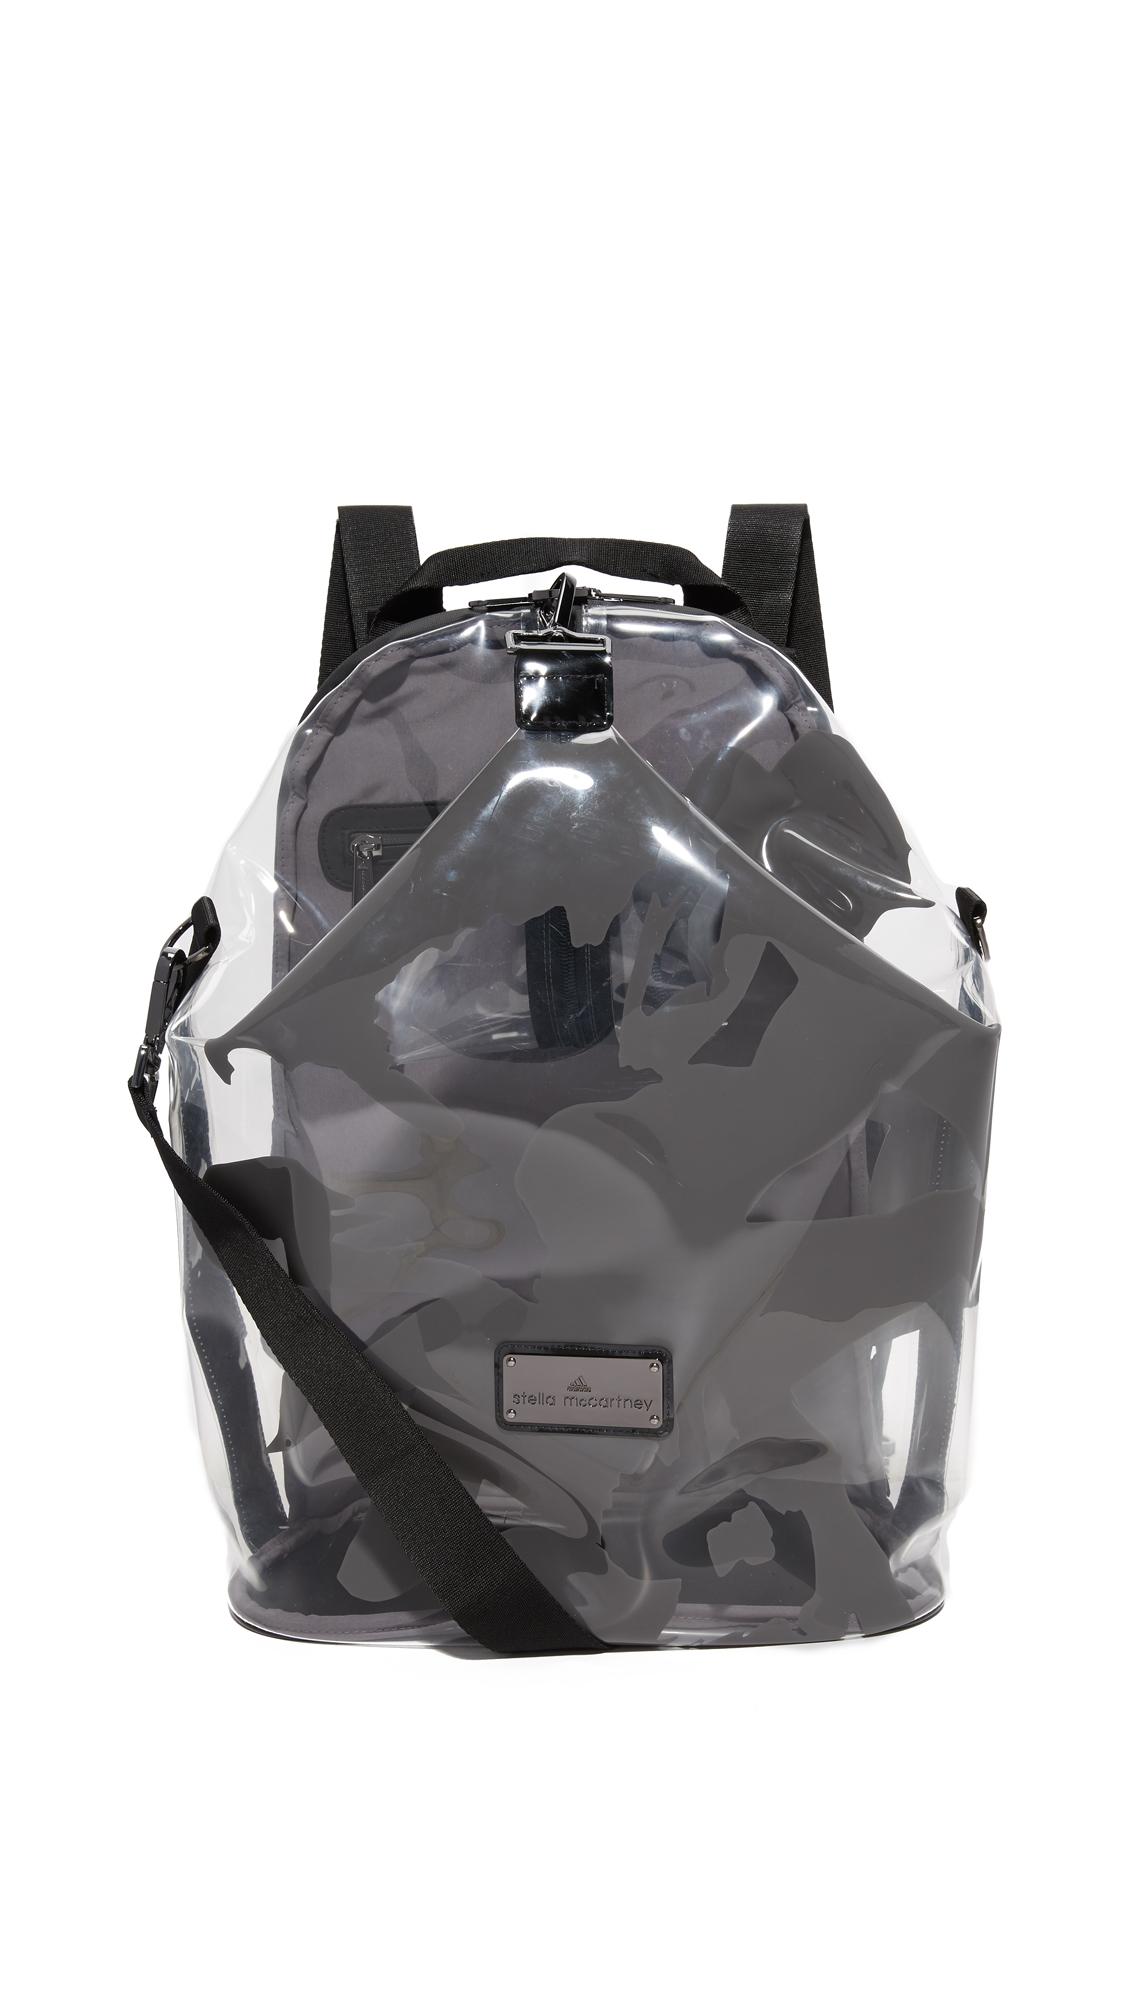 Adidas By Stella Mccartney Swim Bag - Transparent/Black/Cream/White at Shopbop